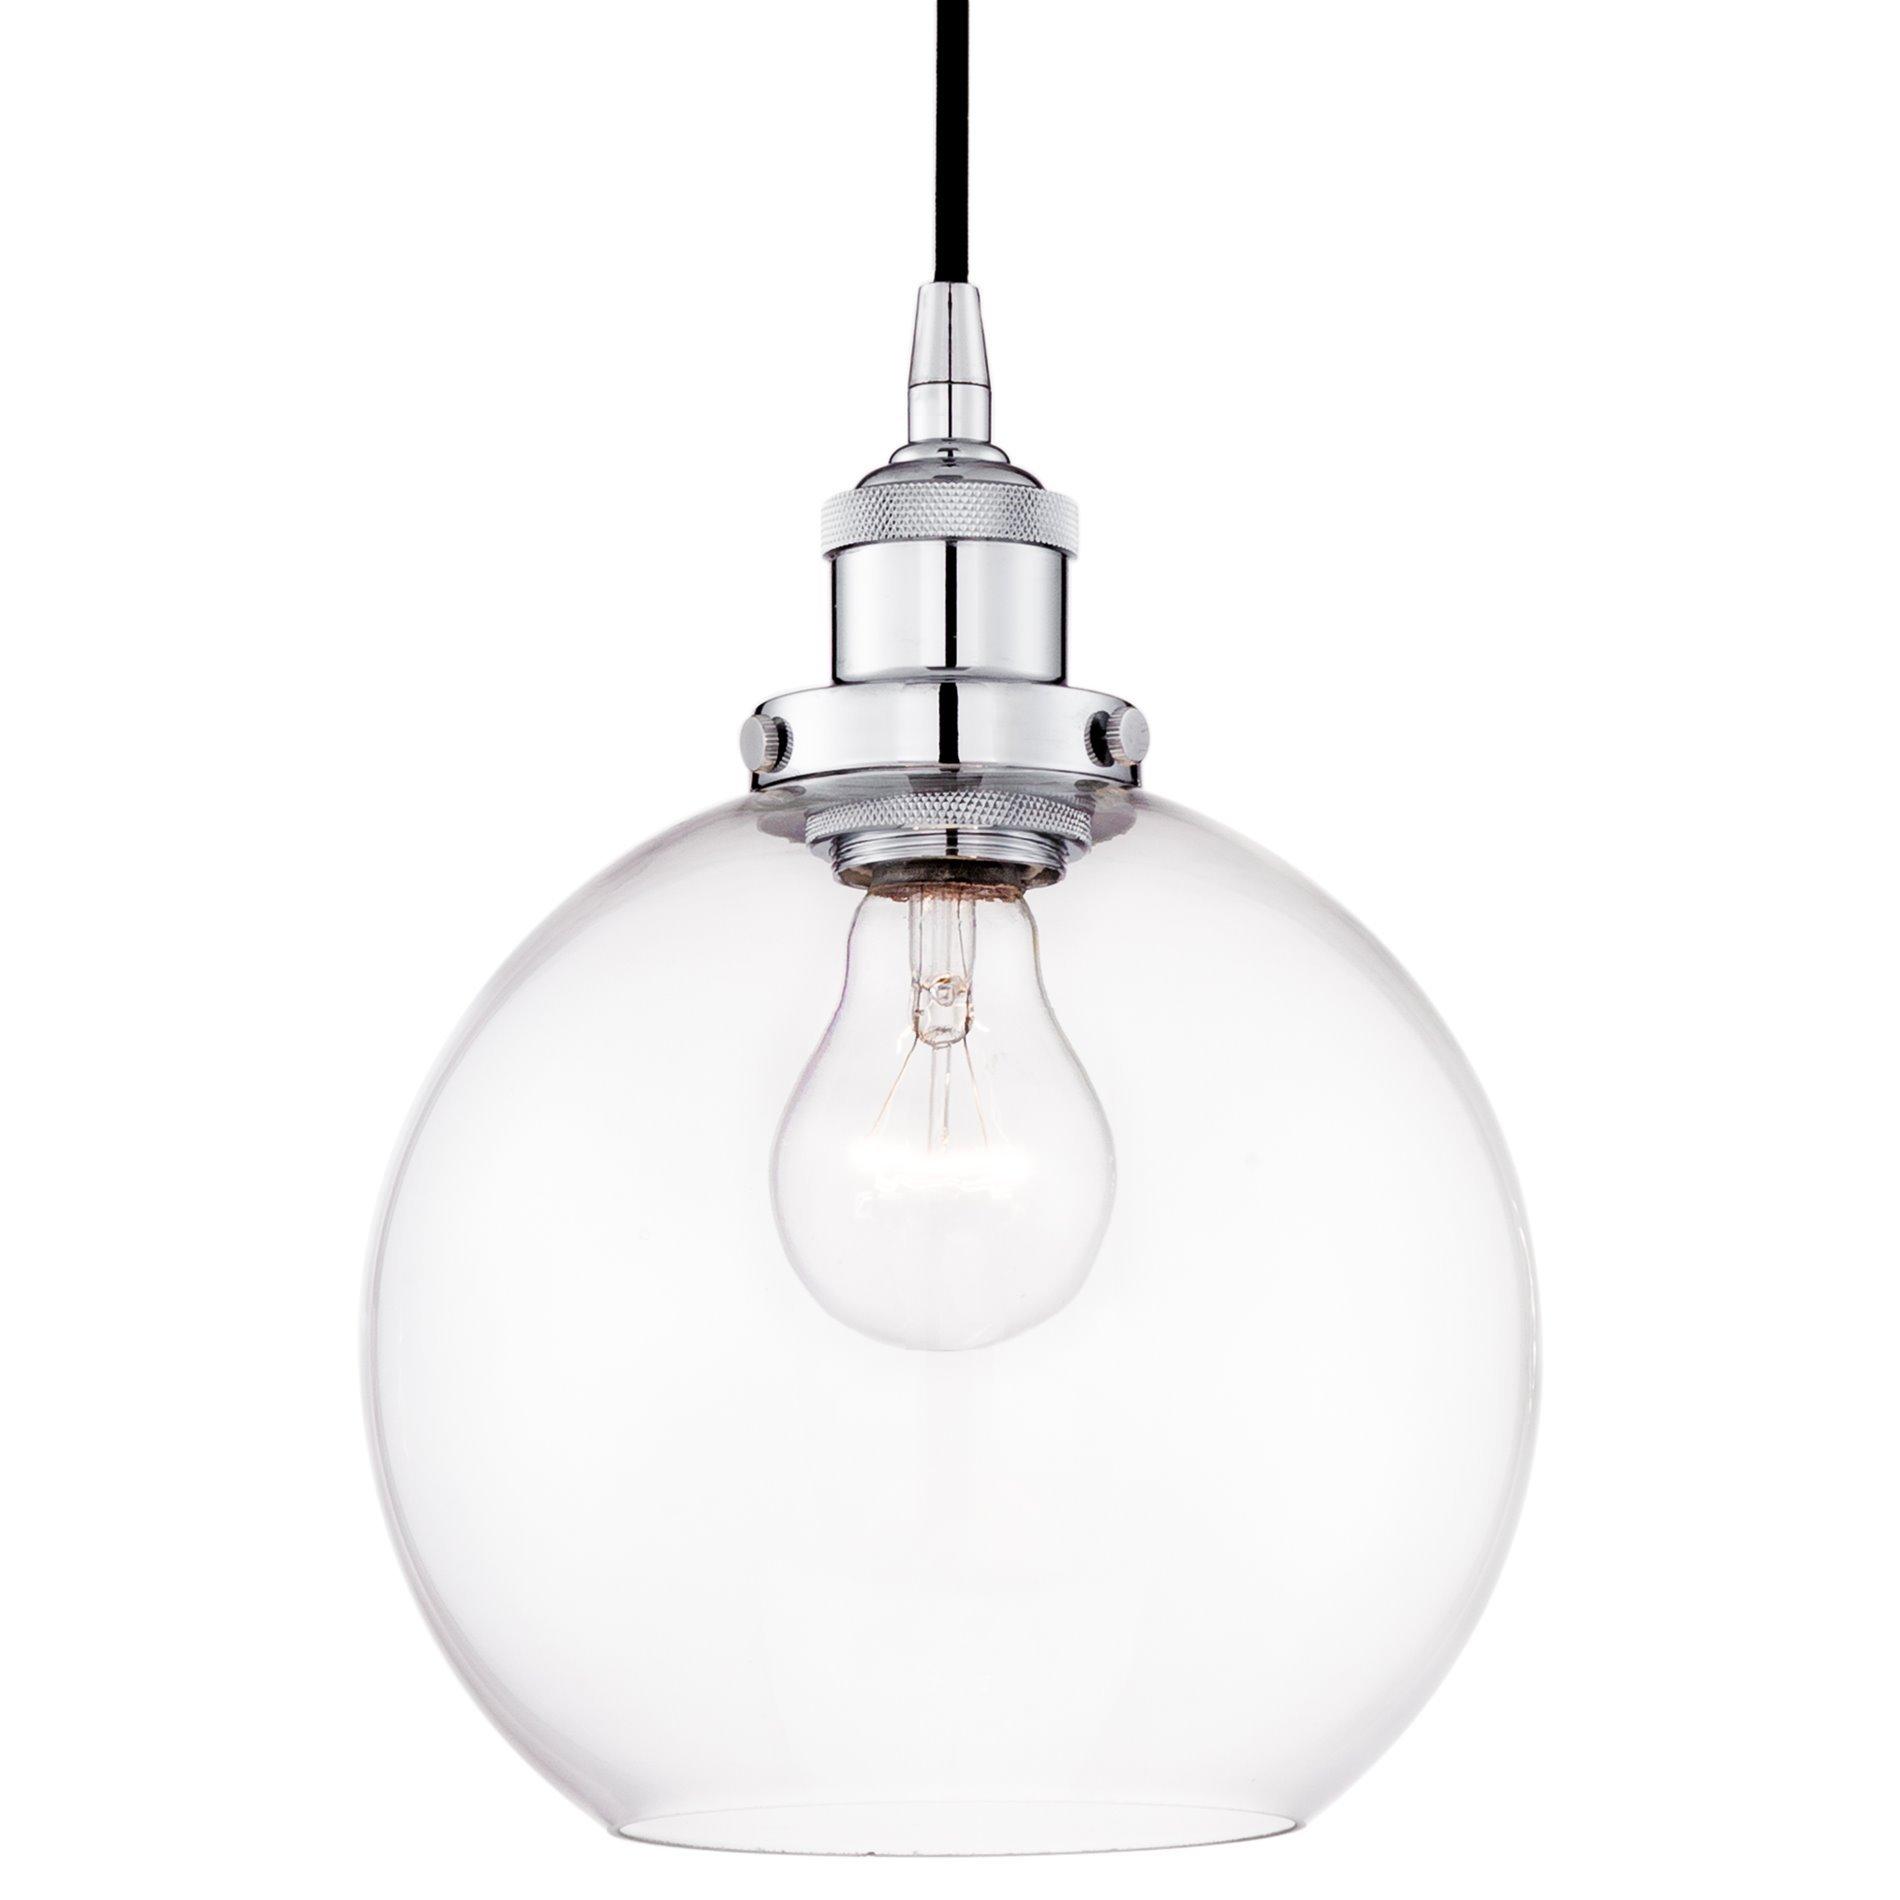 Revel Theia 8'' Transitional Pendant Light + Clear Glass Globe Shade, Chrome Finish